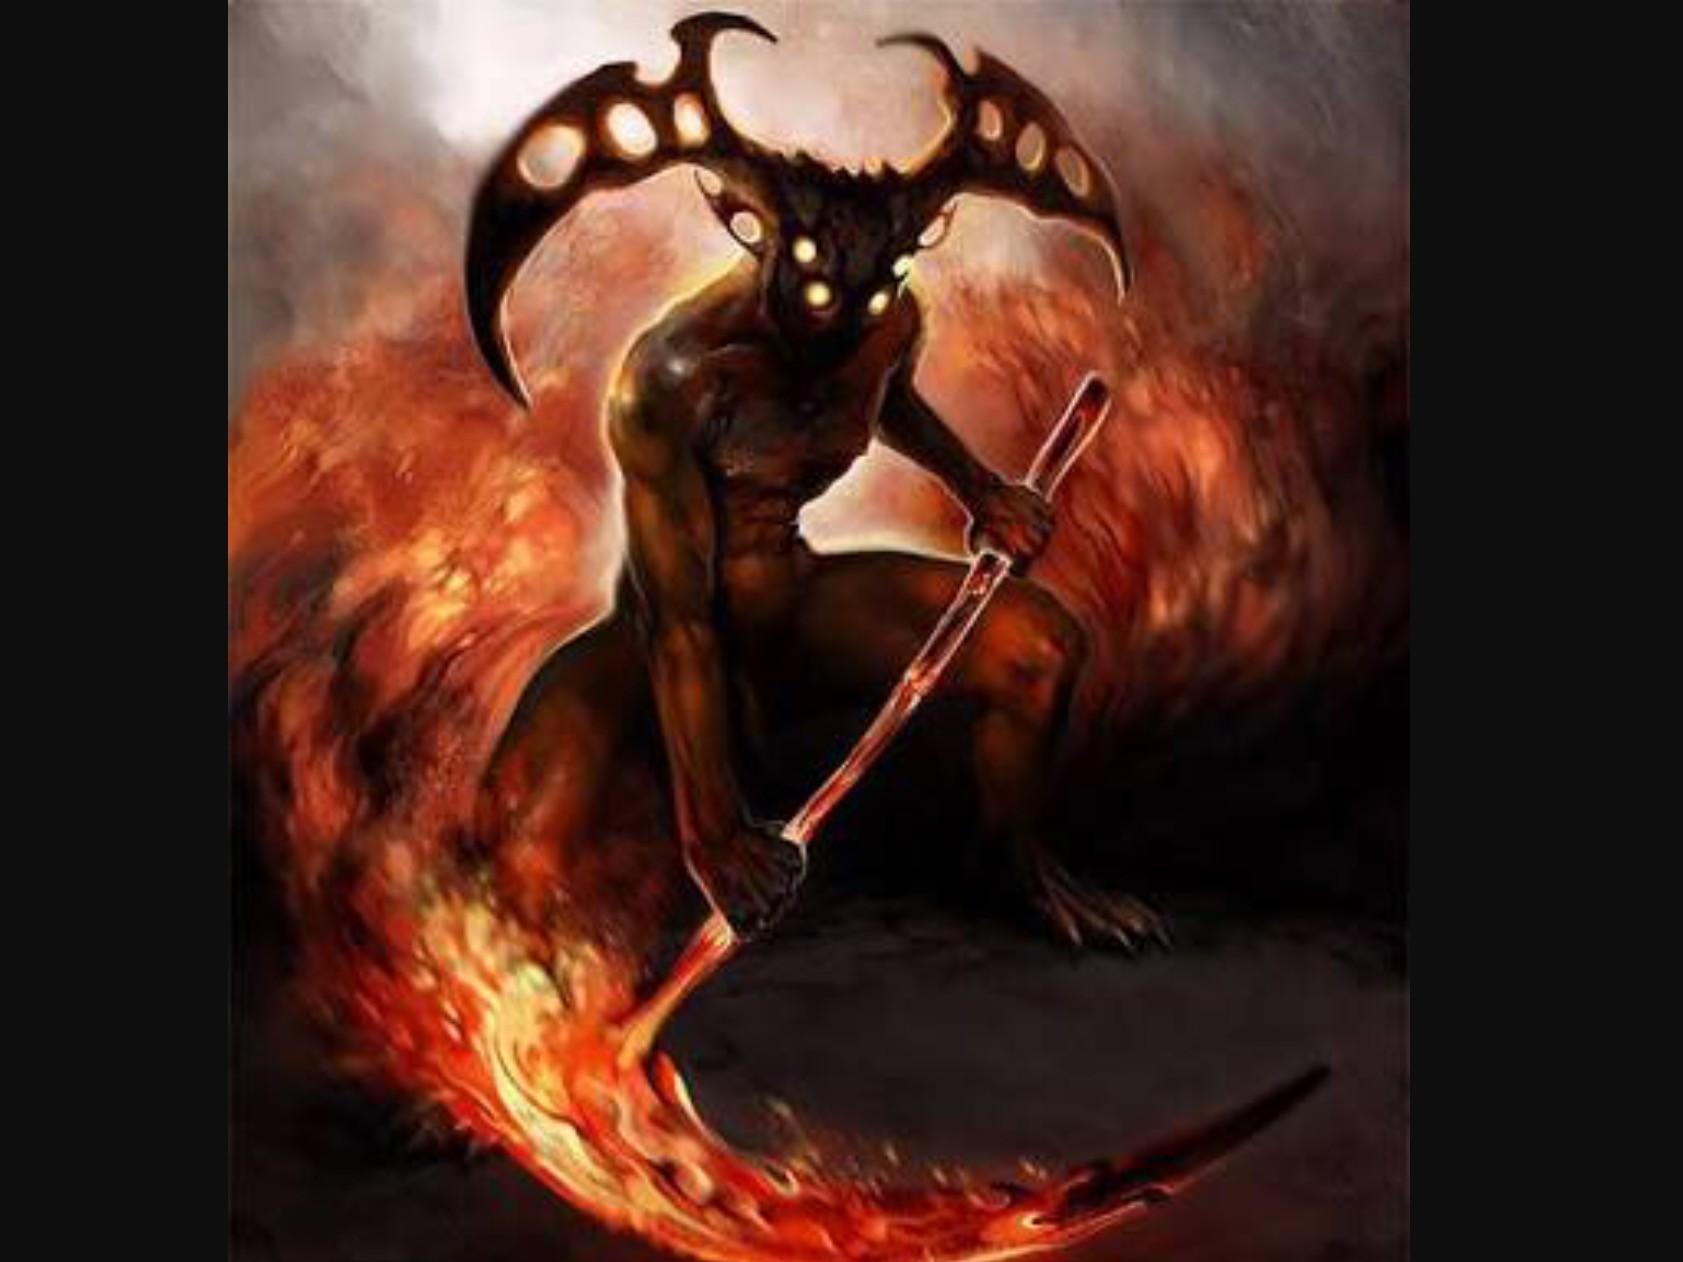 Demons' pets